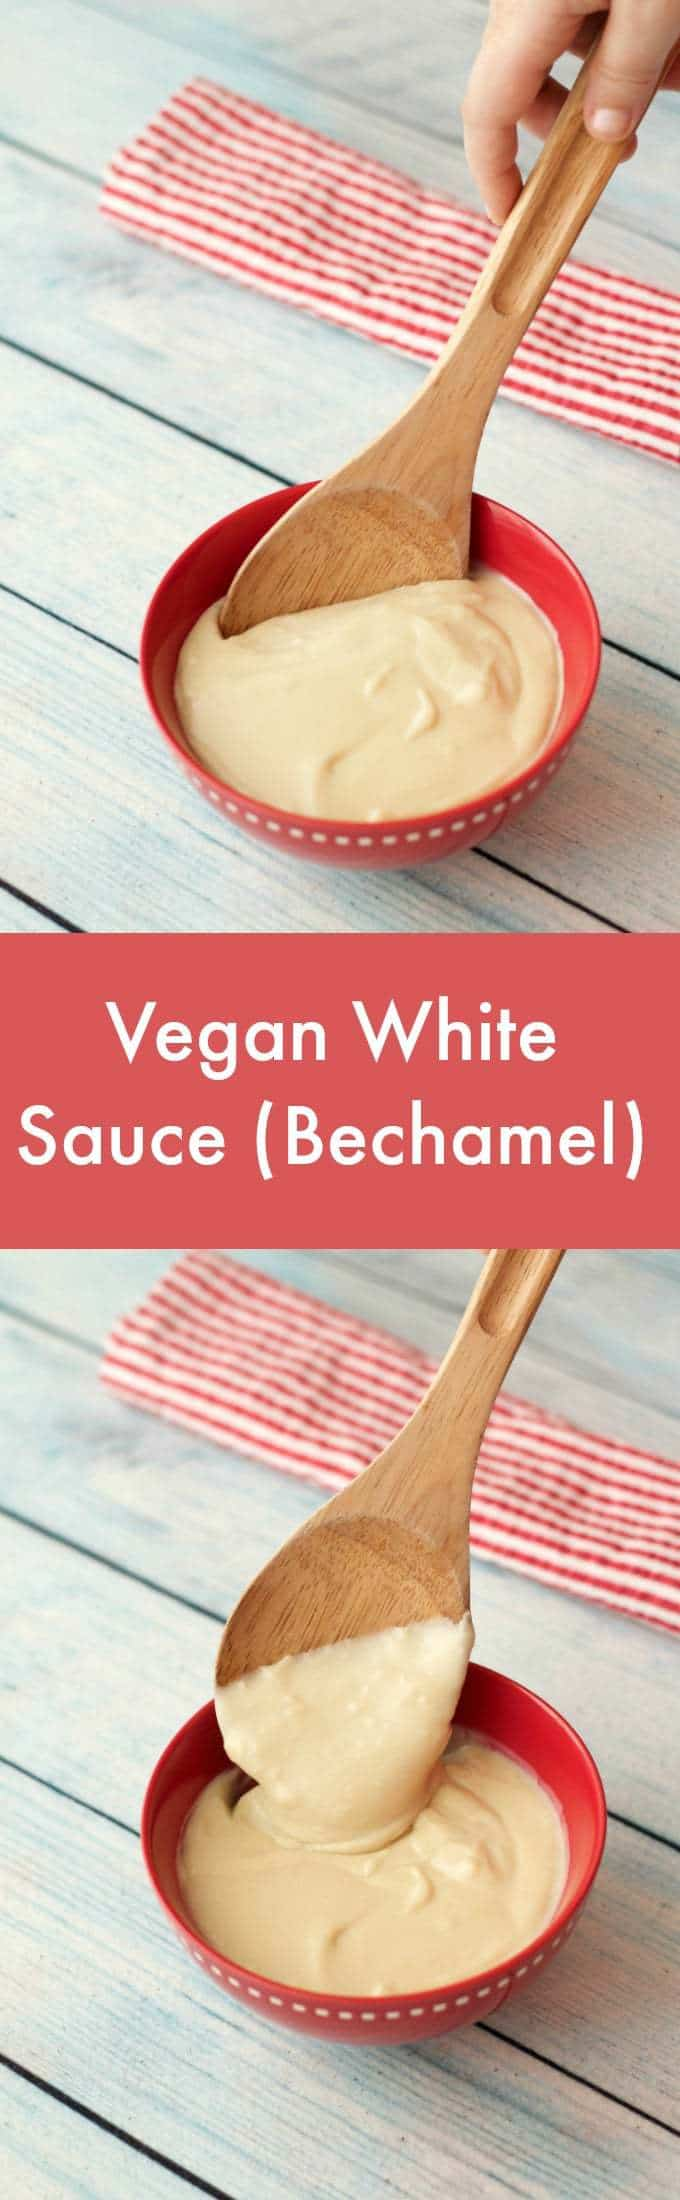 Vegan White Sauce #vegan #bechamel #whitesauce #sauce #lovingitvegan #dairyfree